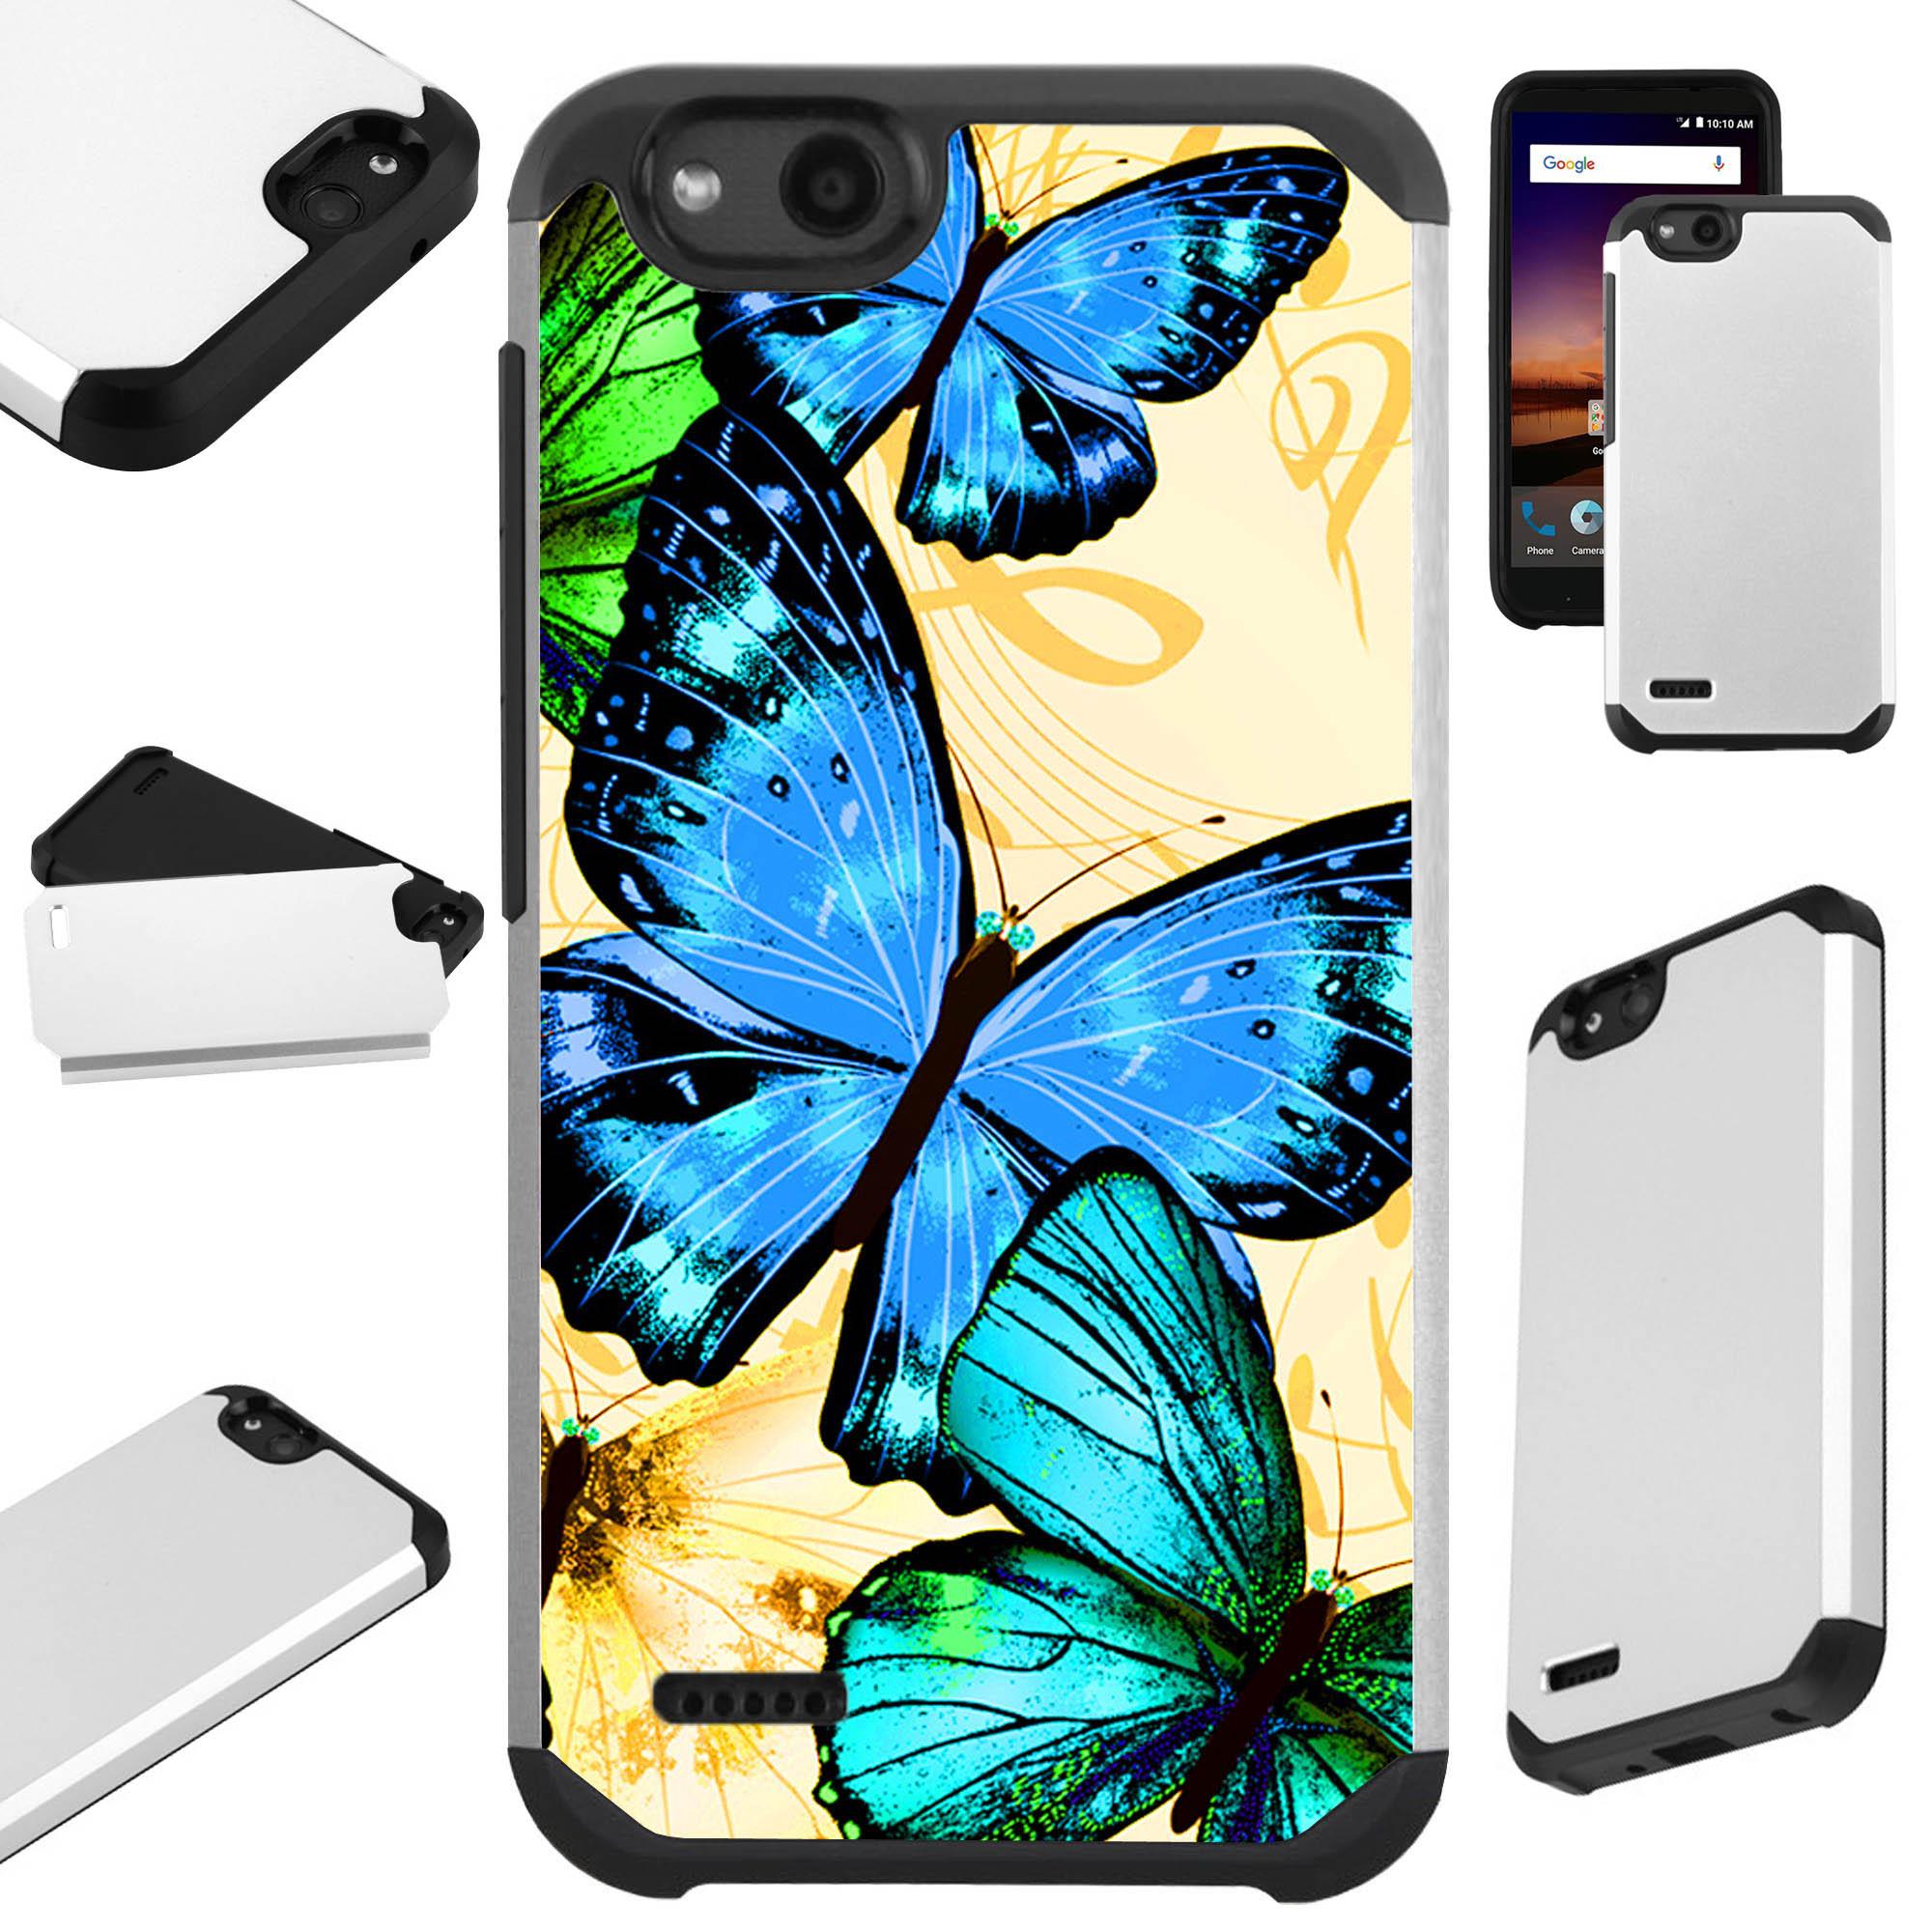 For ZTE ZFive G LTE / ZFive C / Avid 4 / Fanfare 3 / Blade Vantage / Tempo X / Tempo Go Case Hybrid TPU Fusion Phone Cover (Blue Butterfly)